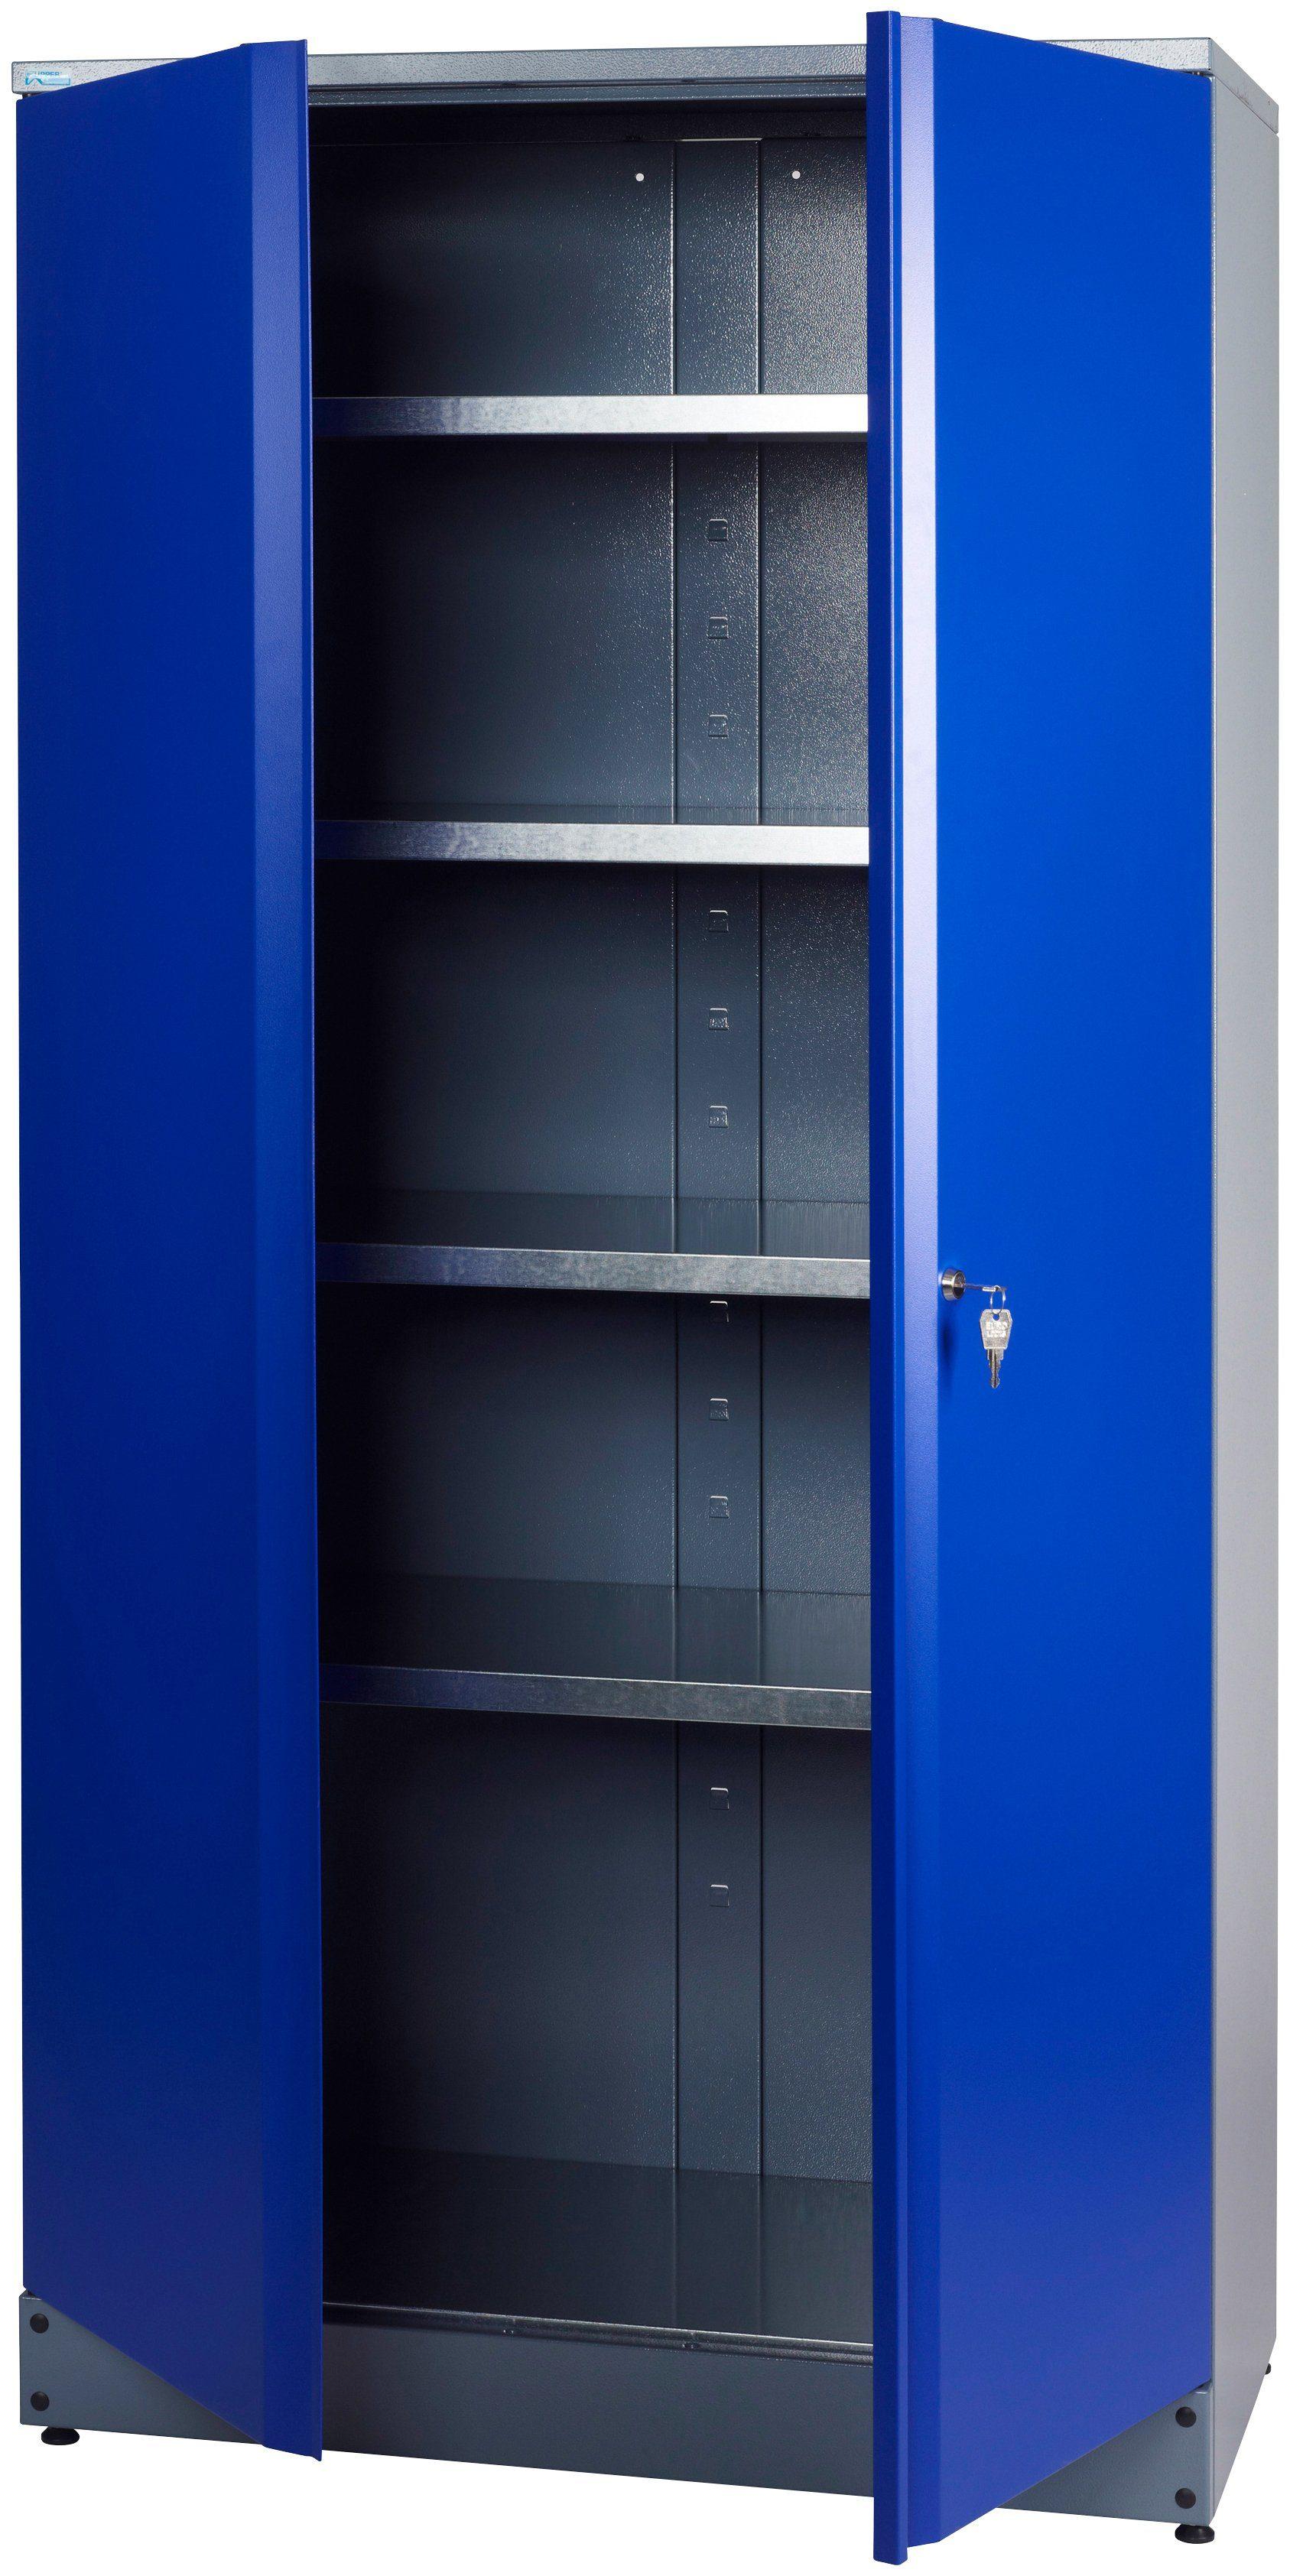 KÜPPER Hochschrank »2 Türen, 4 Einlegeböden, in ultramarinblau«